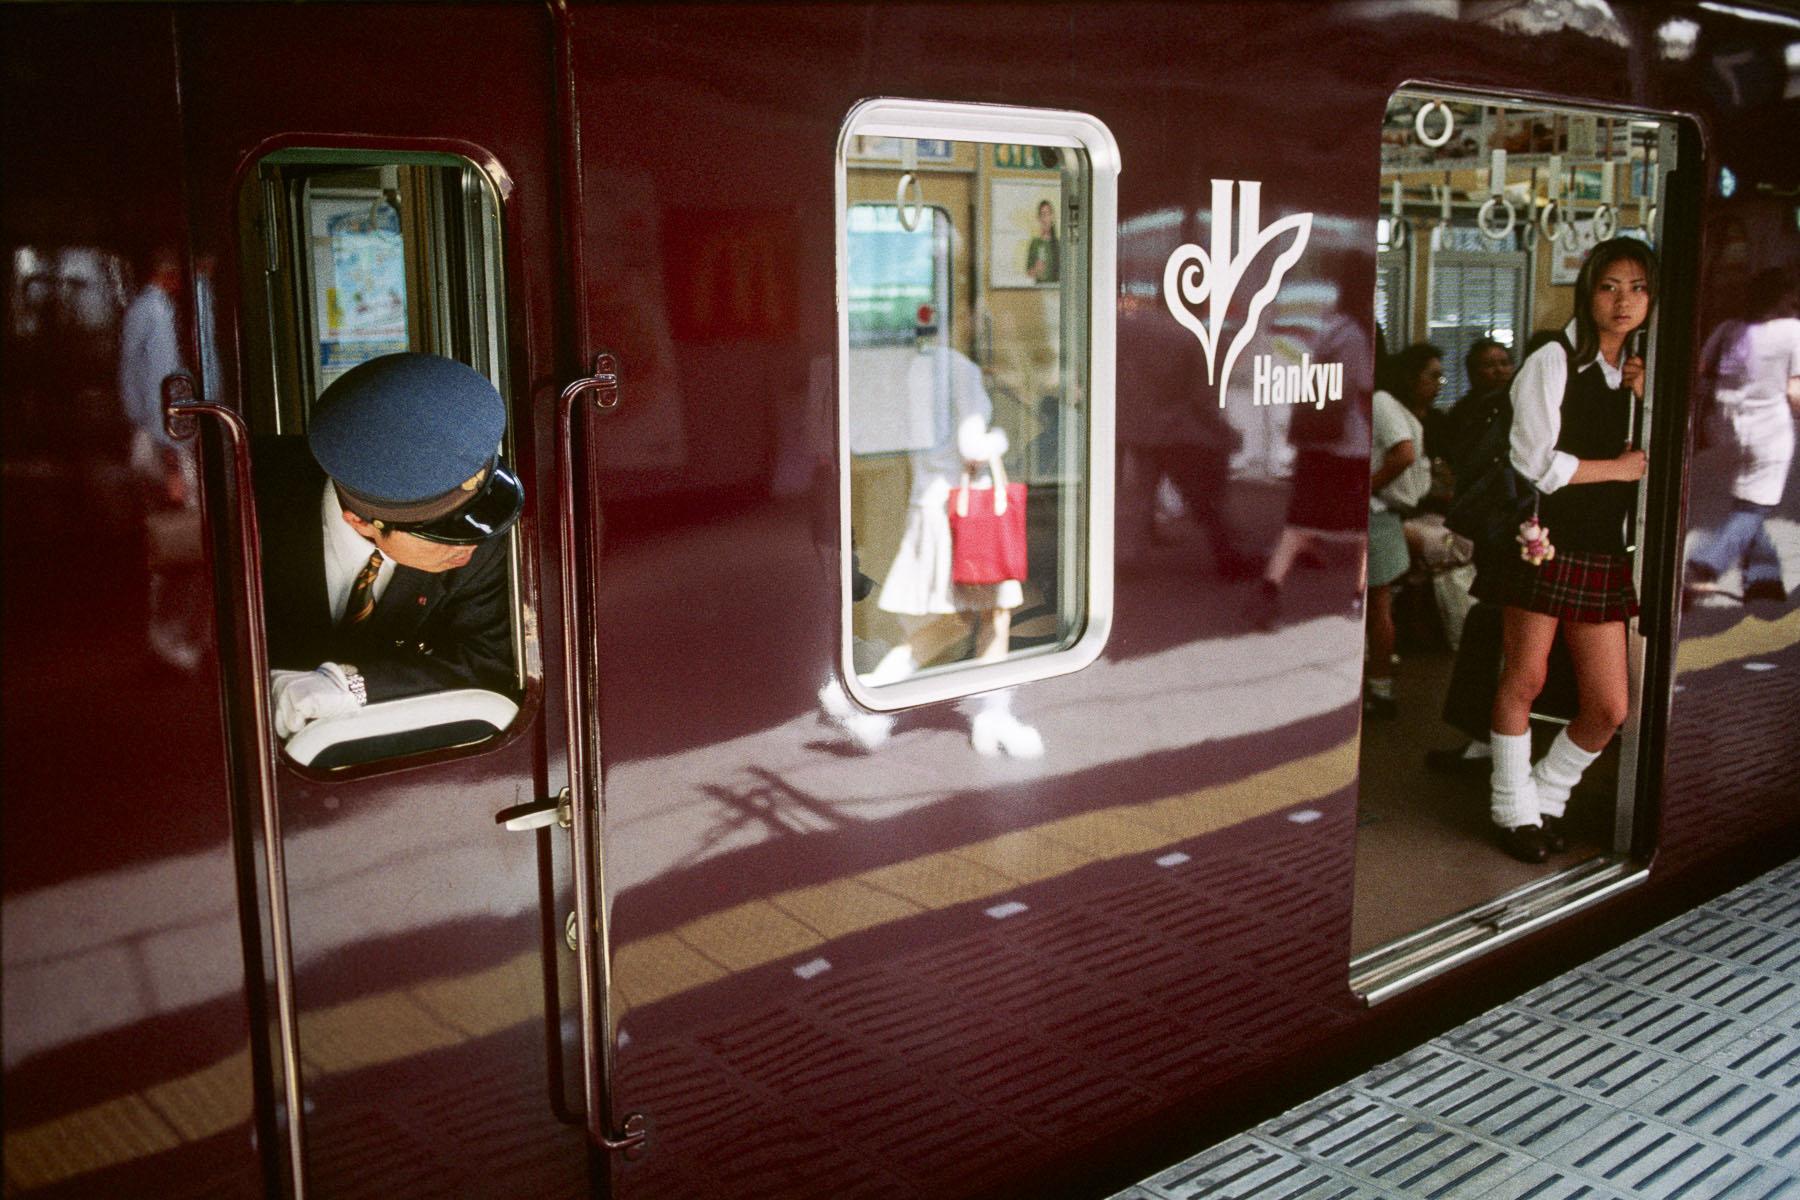 Sannomiya Station in May 1999